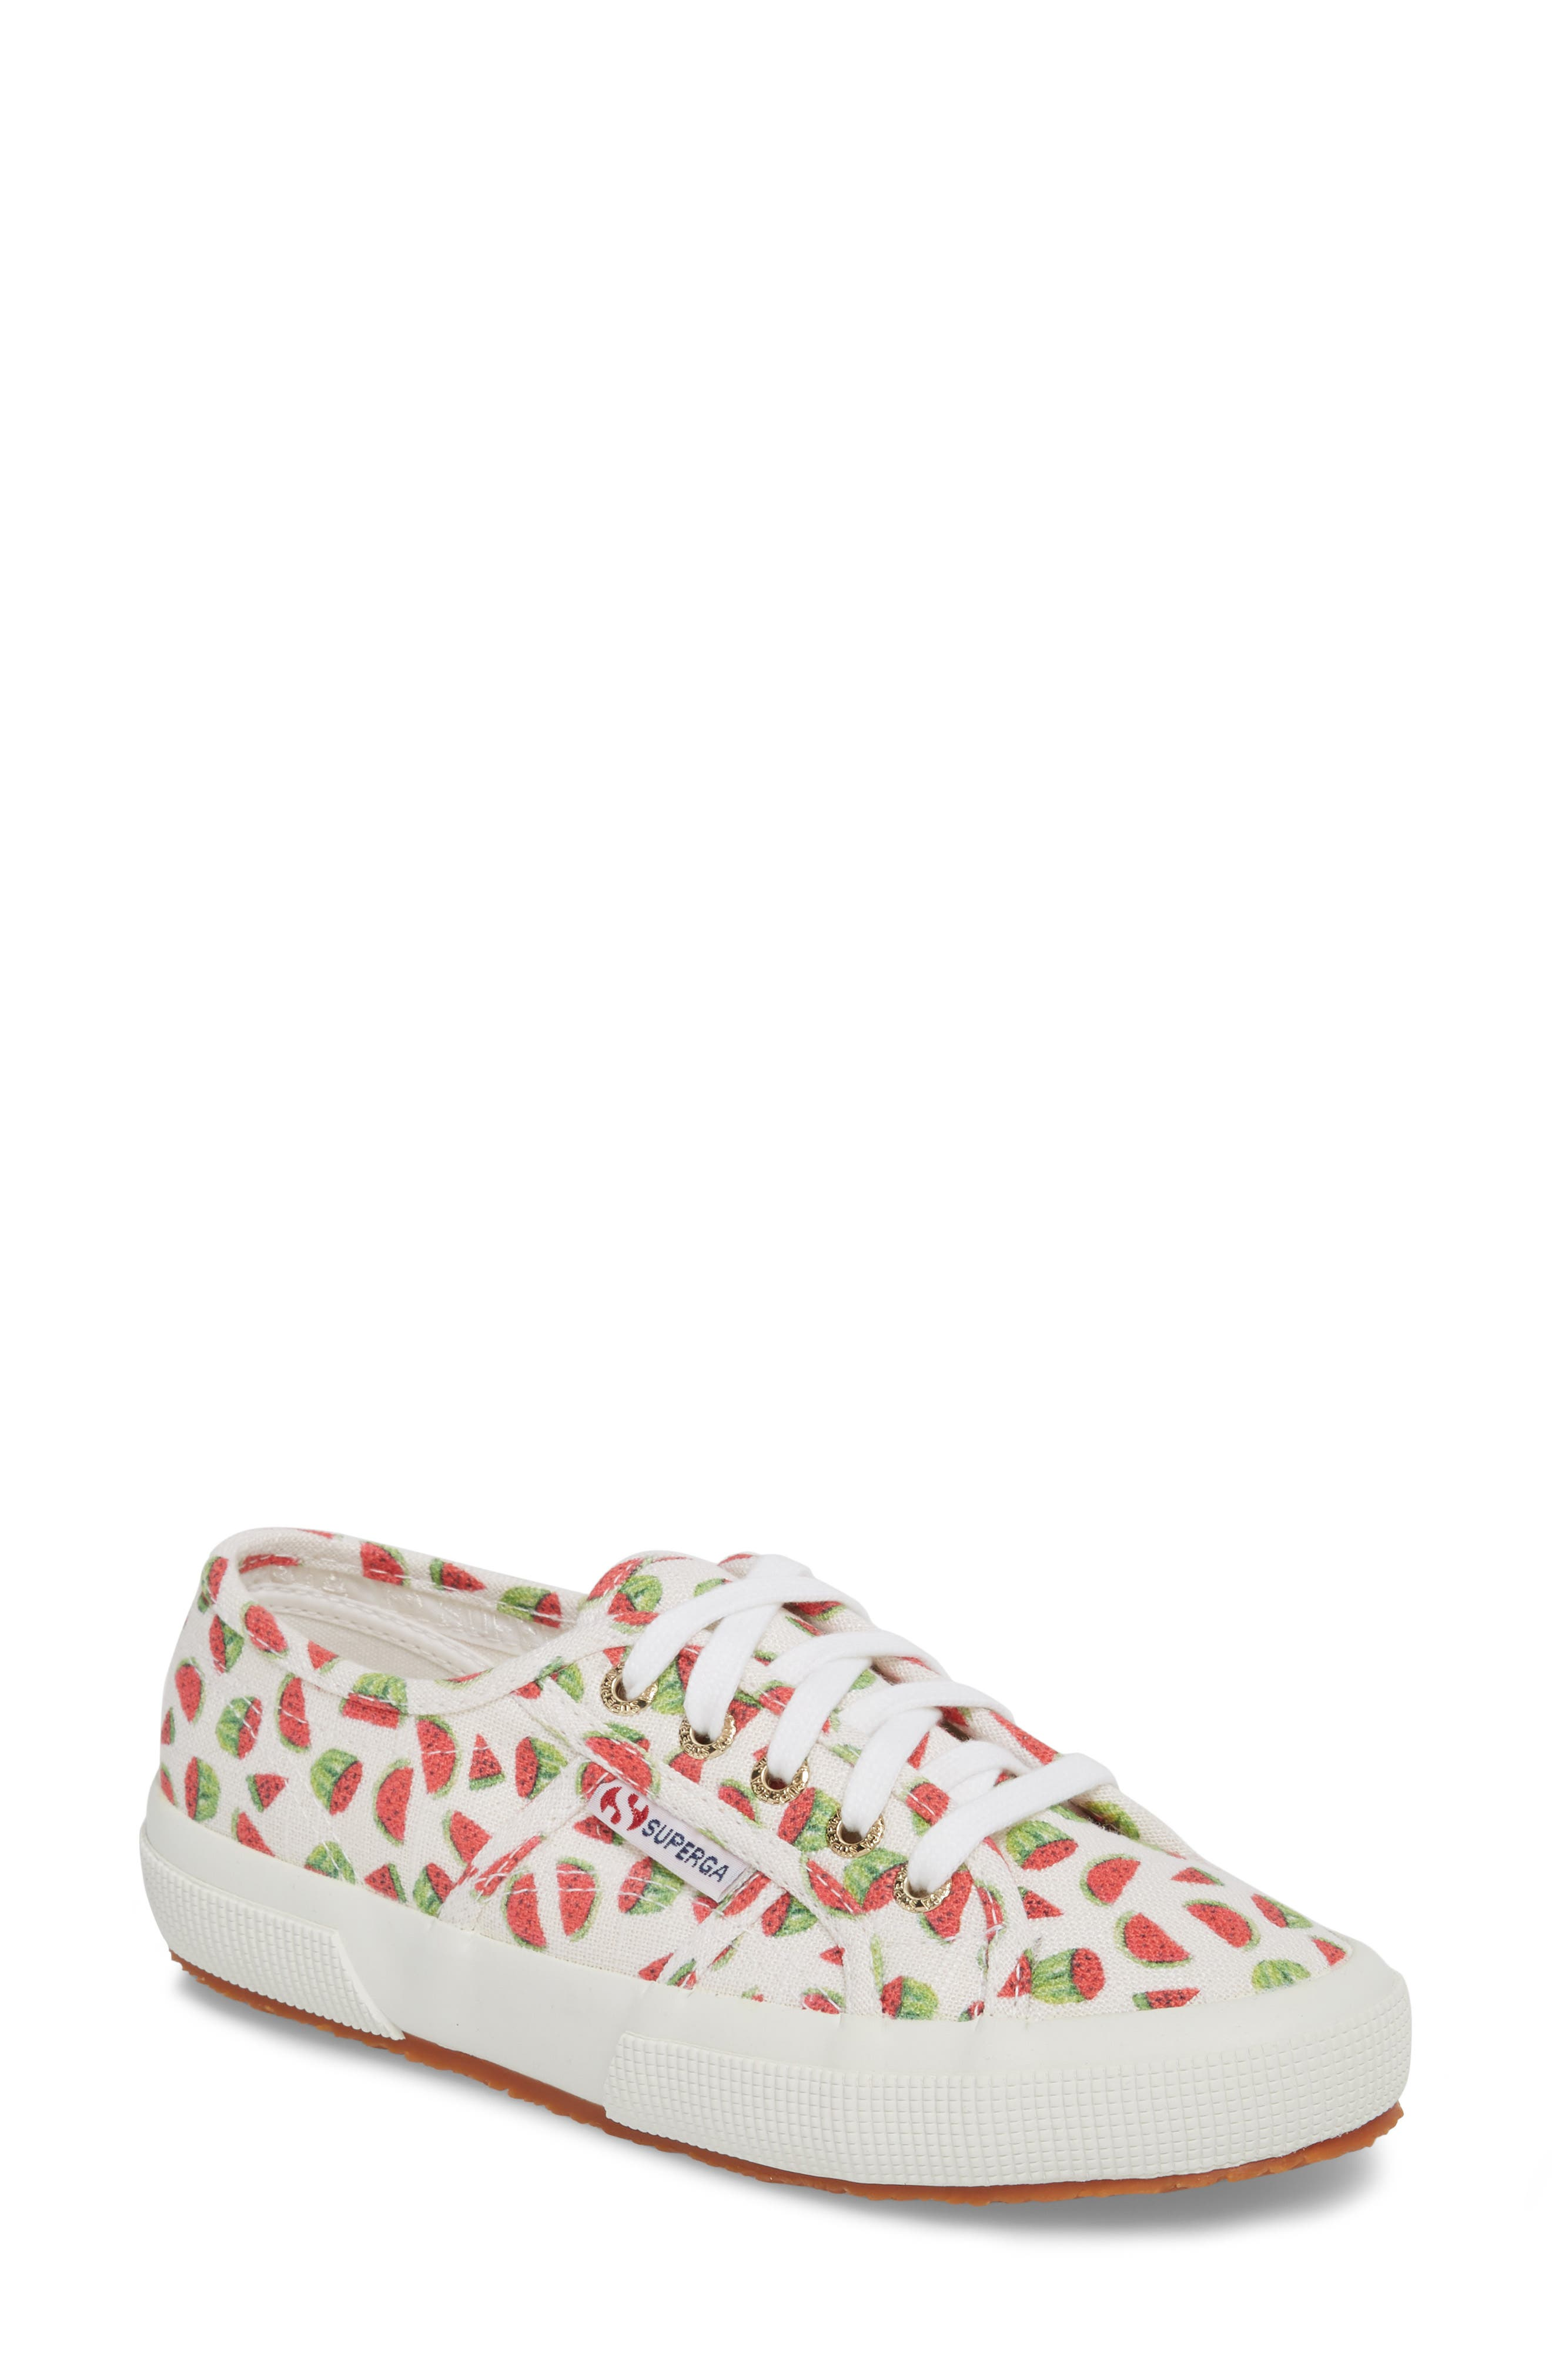 2750 Linenfruit Low Top Sneaker,                         Main,                         color, 600